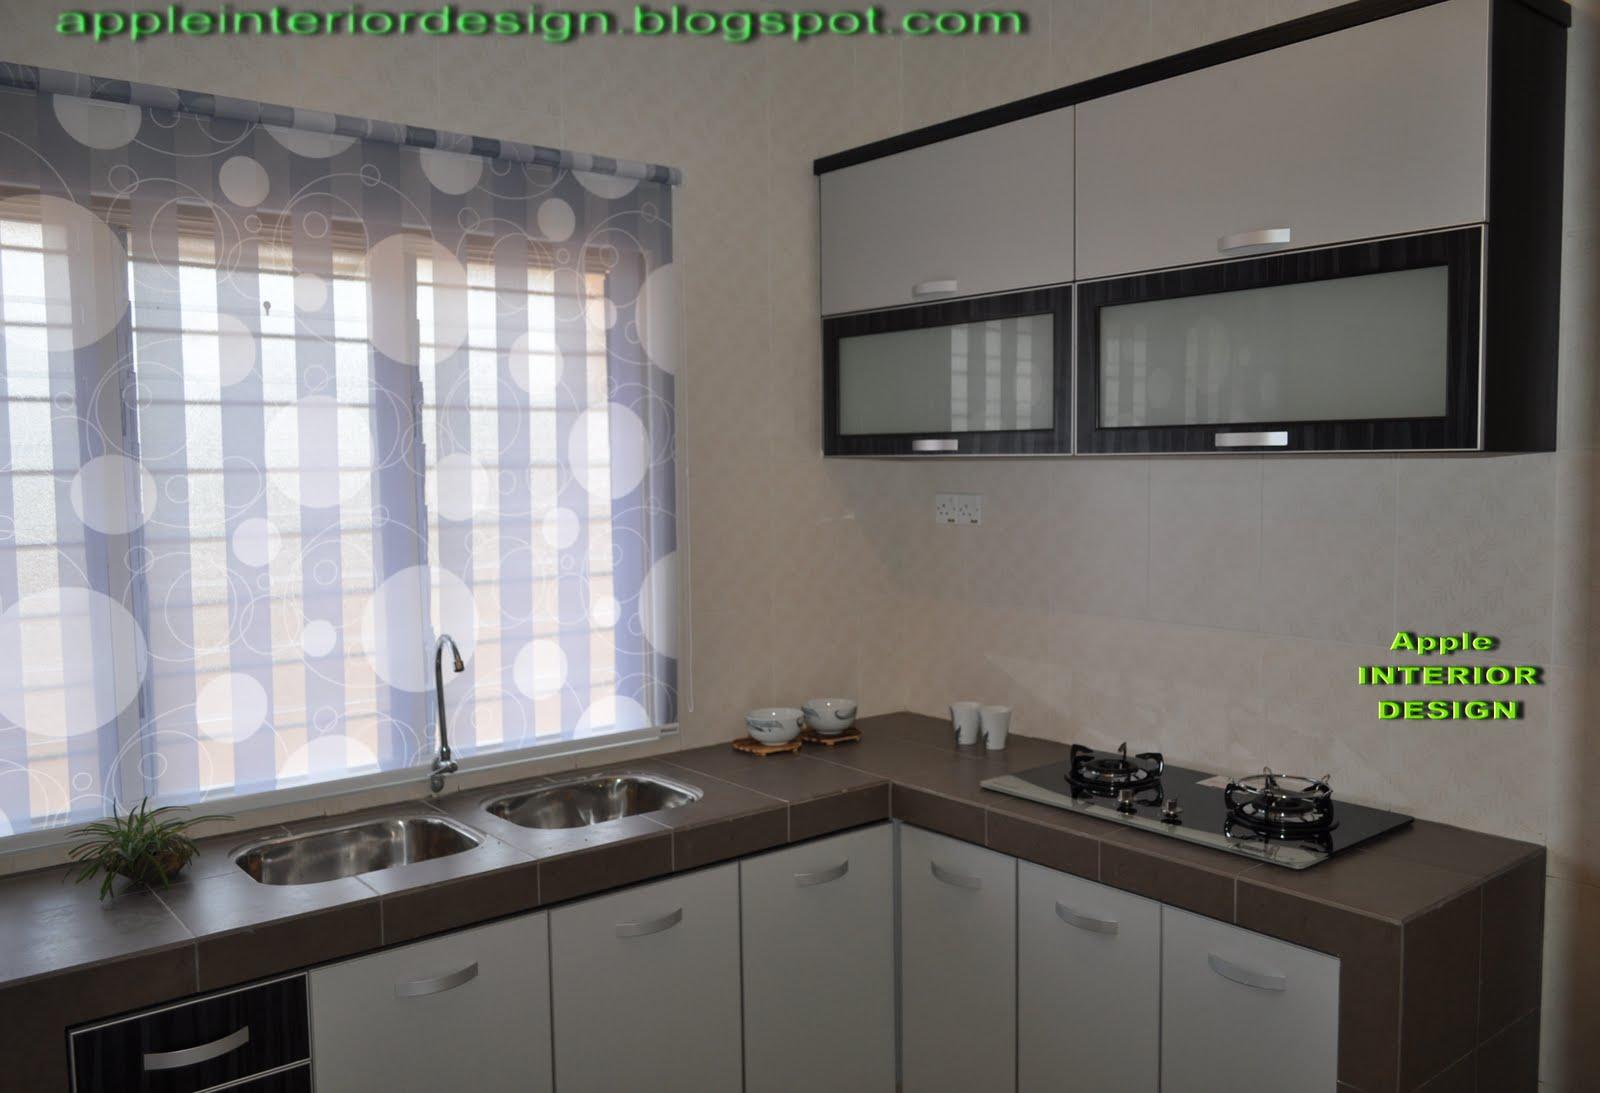 Kitchen Accessories With Apple Theme | New interior design